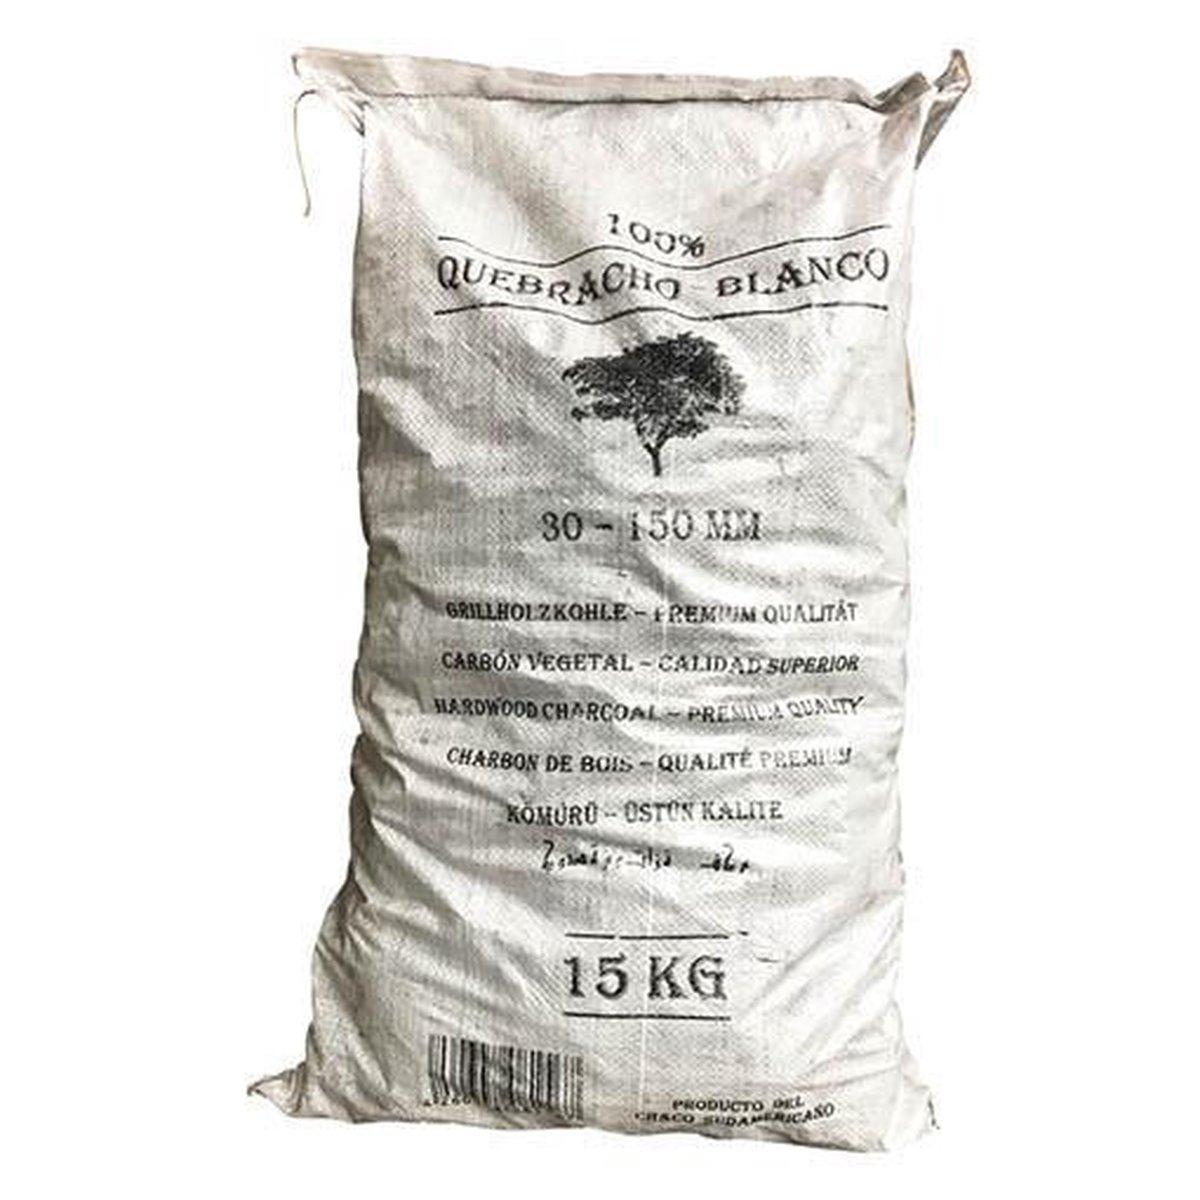 Quokware Houtskool White QueBracho, 15kg